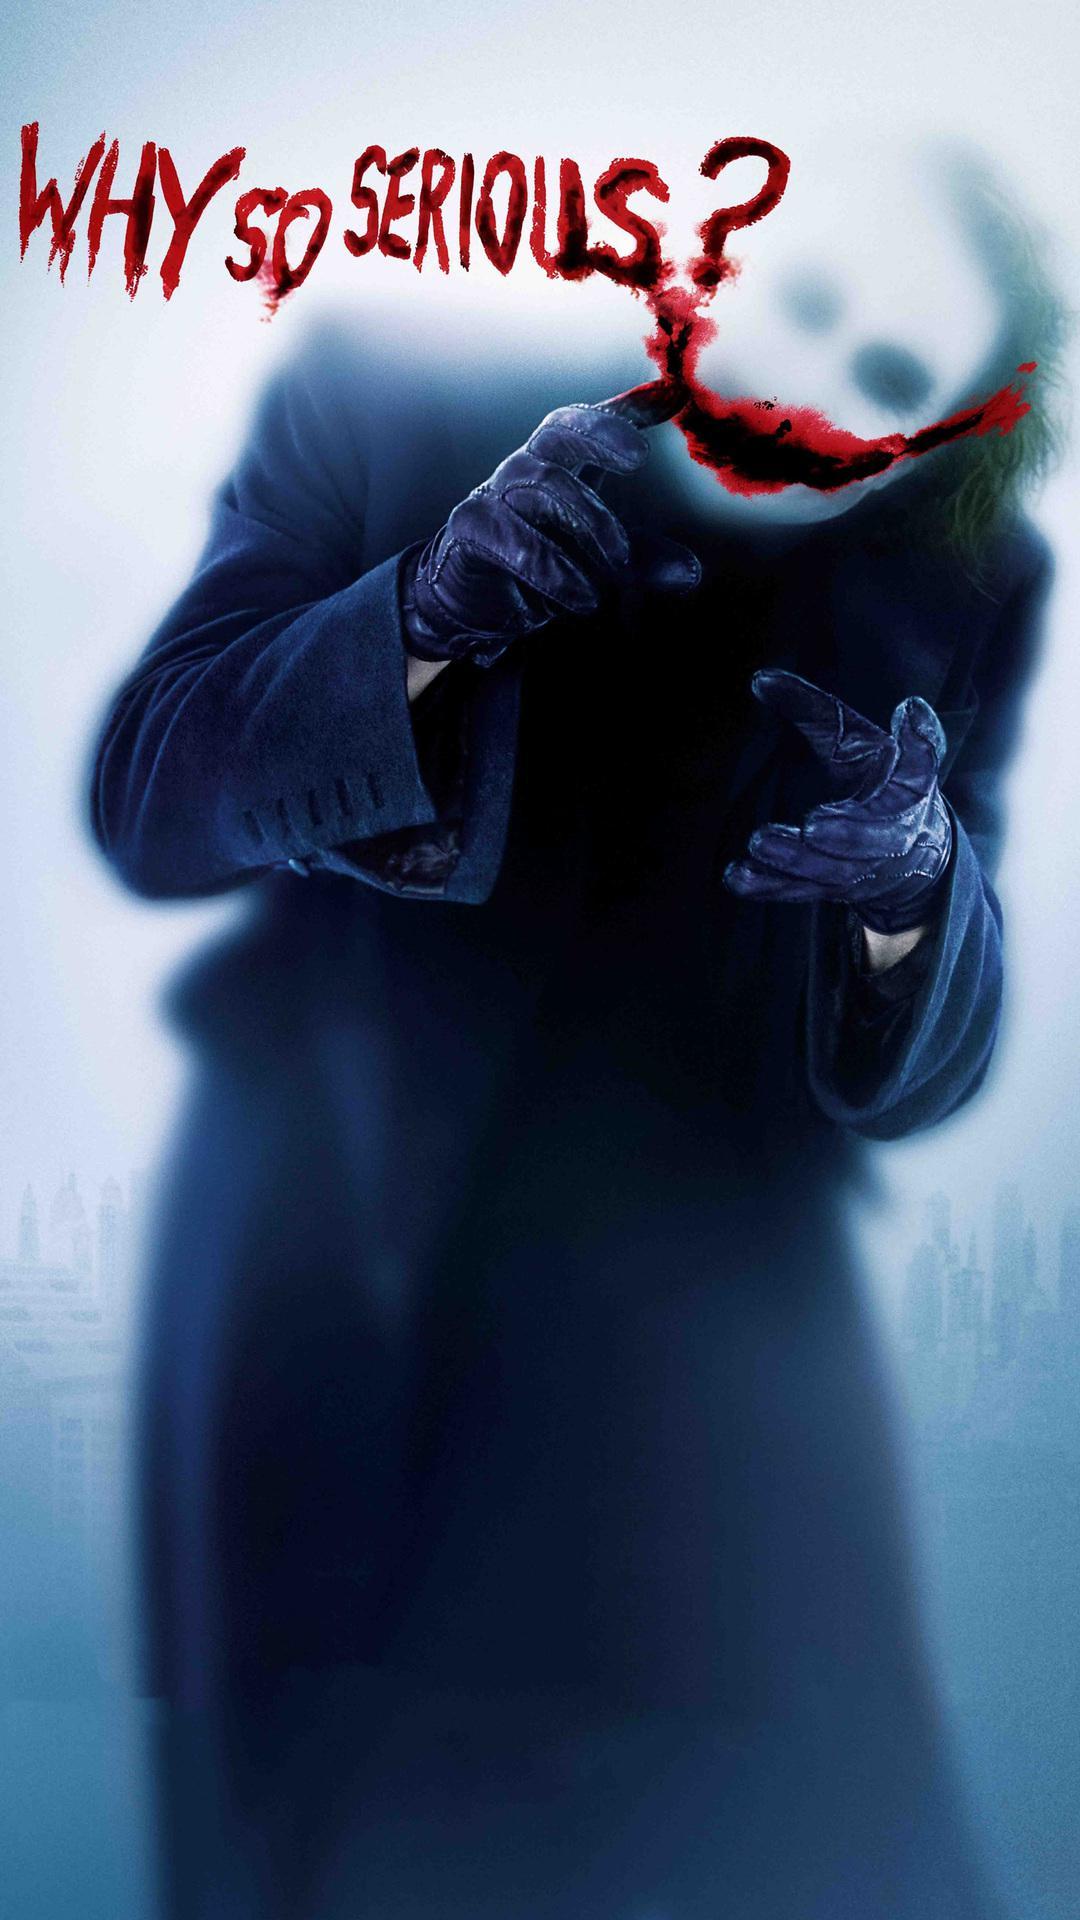 Joker HD wallpapers for iphone67